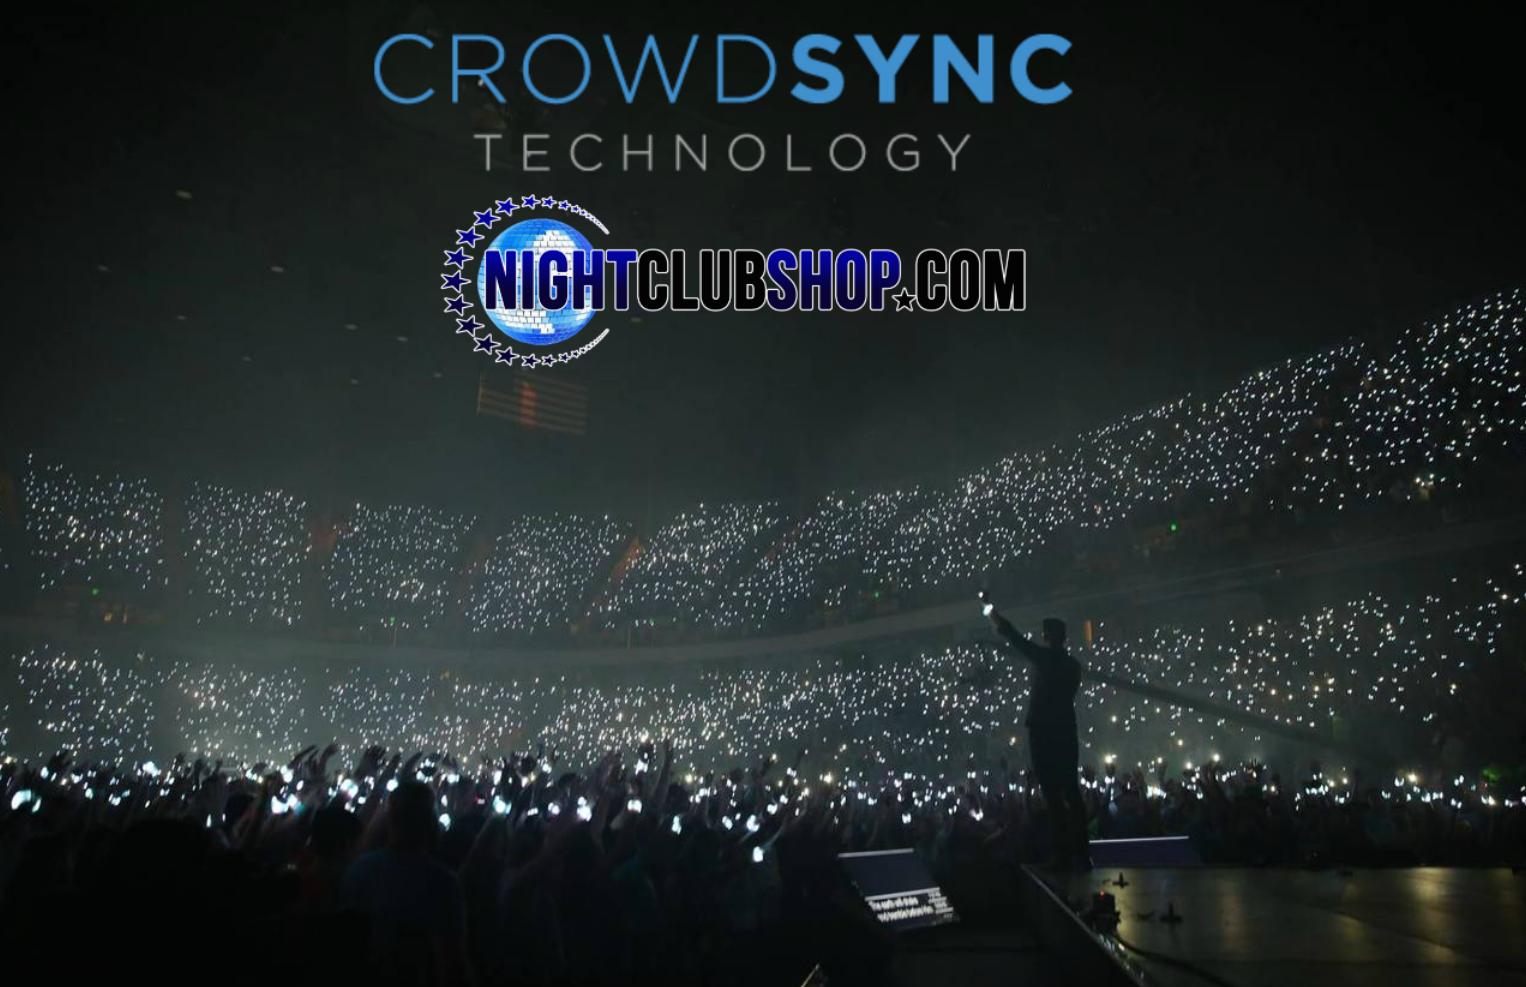 nightclubshop-rf-led-wristband-crowdsync-technology.png